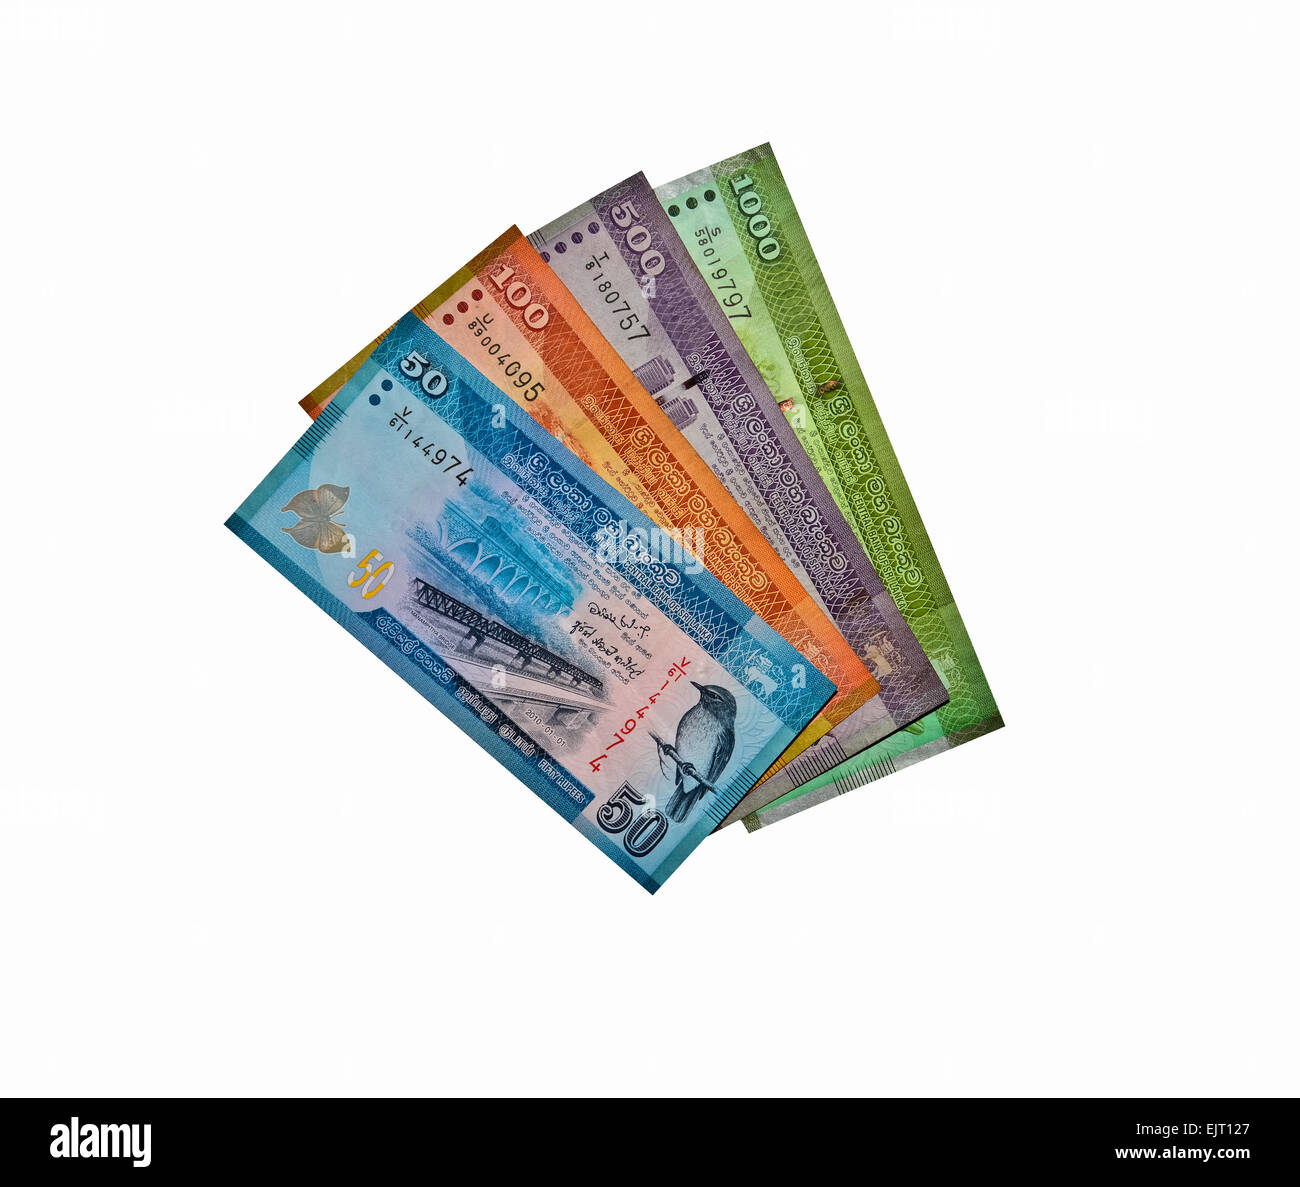 Sri lankan currency stock photos sri lankan currency stock images sri lankan currency rupee notes stock image altavistaventures Images